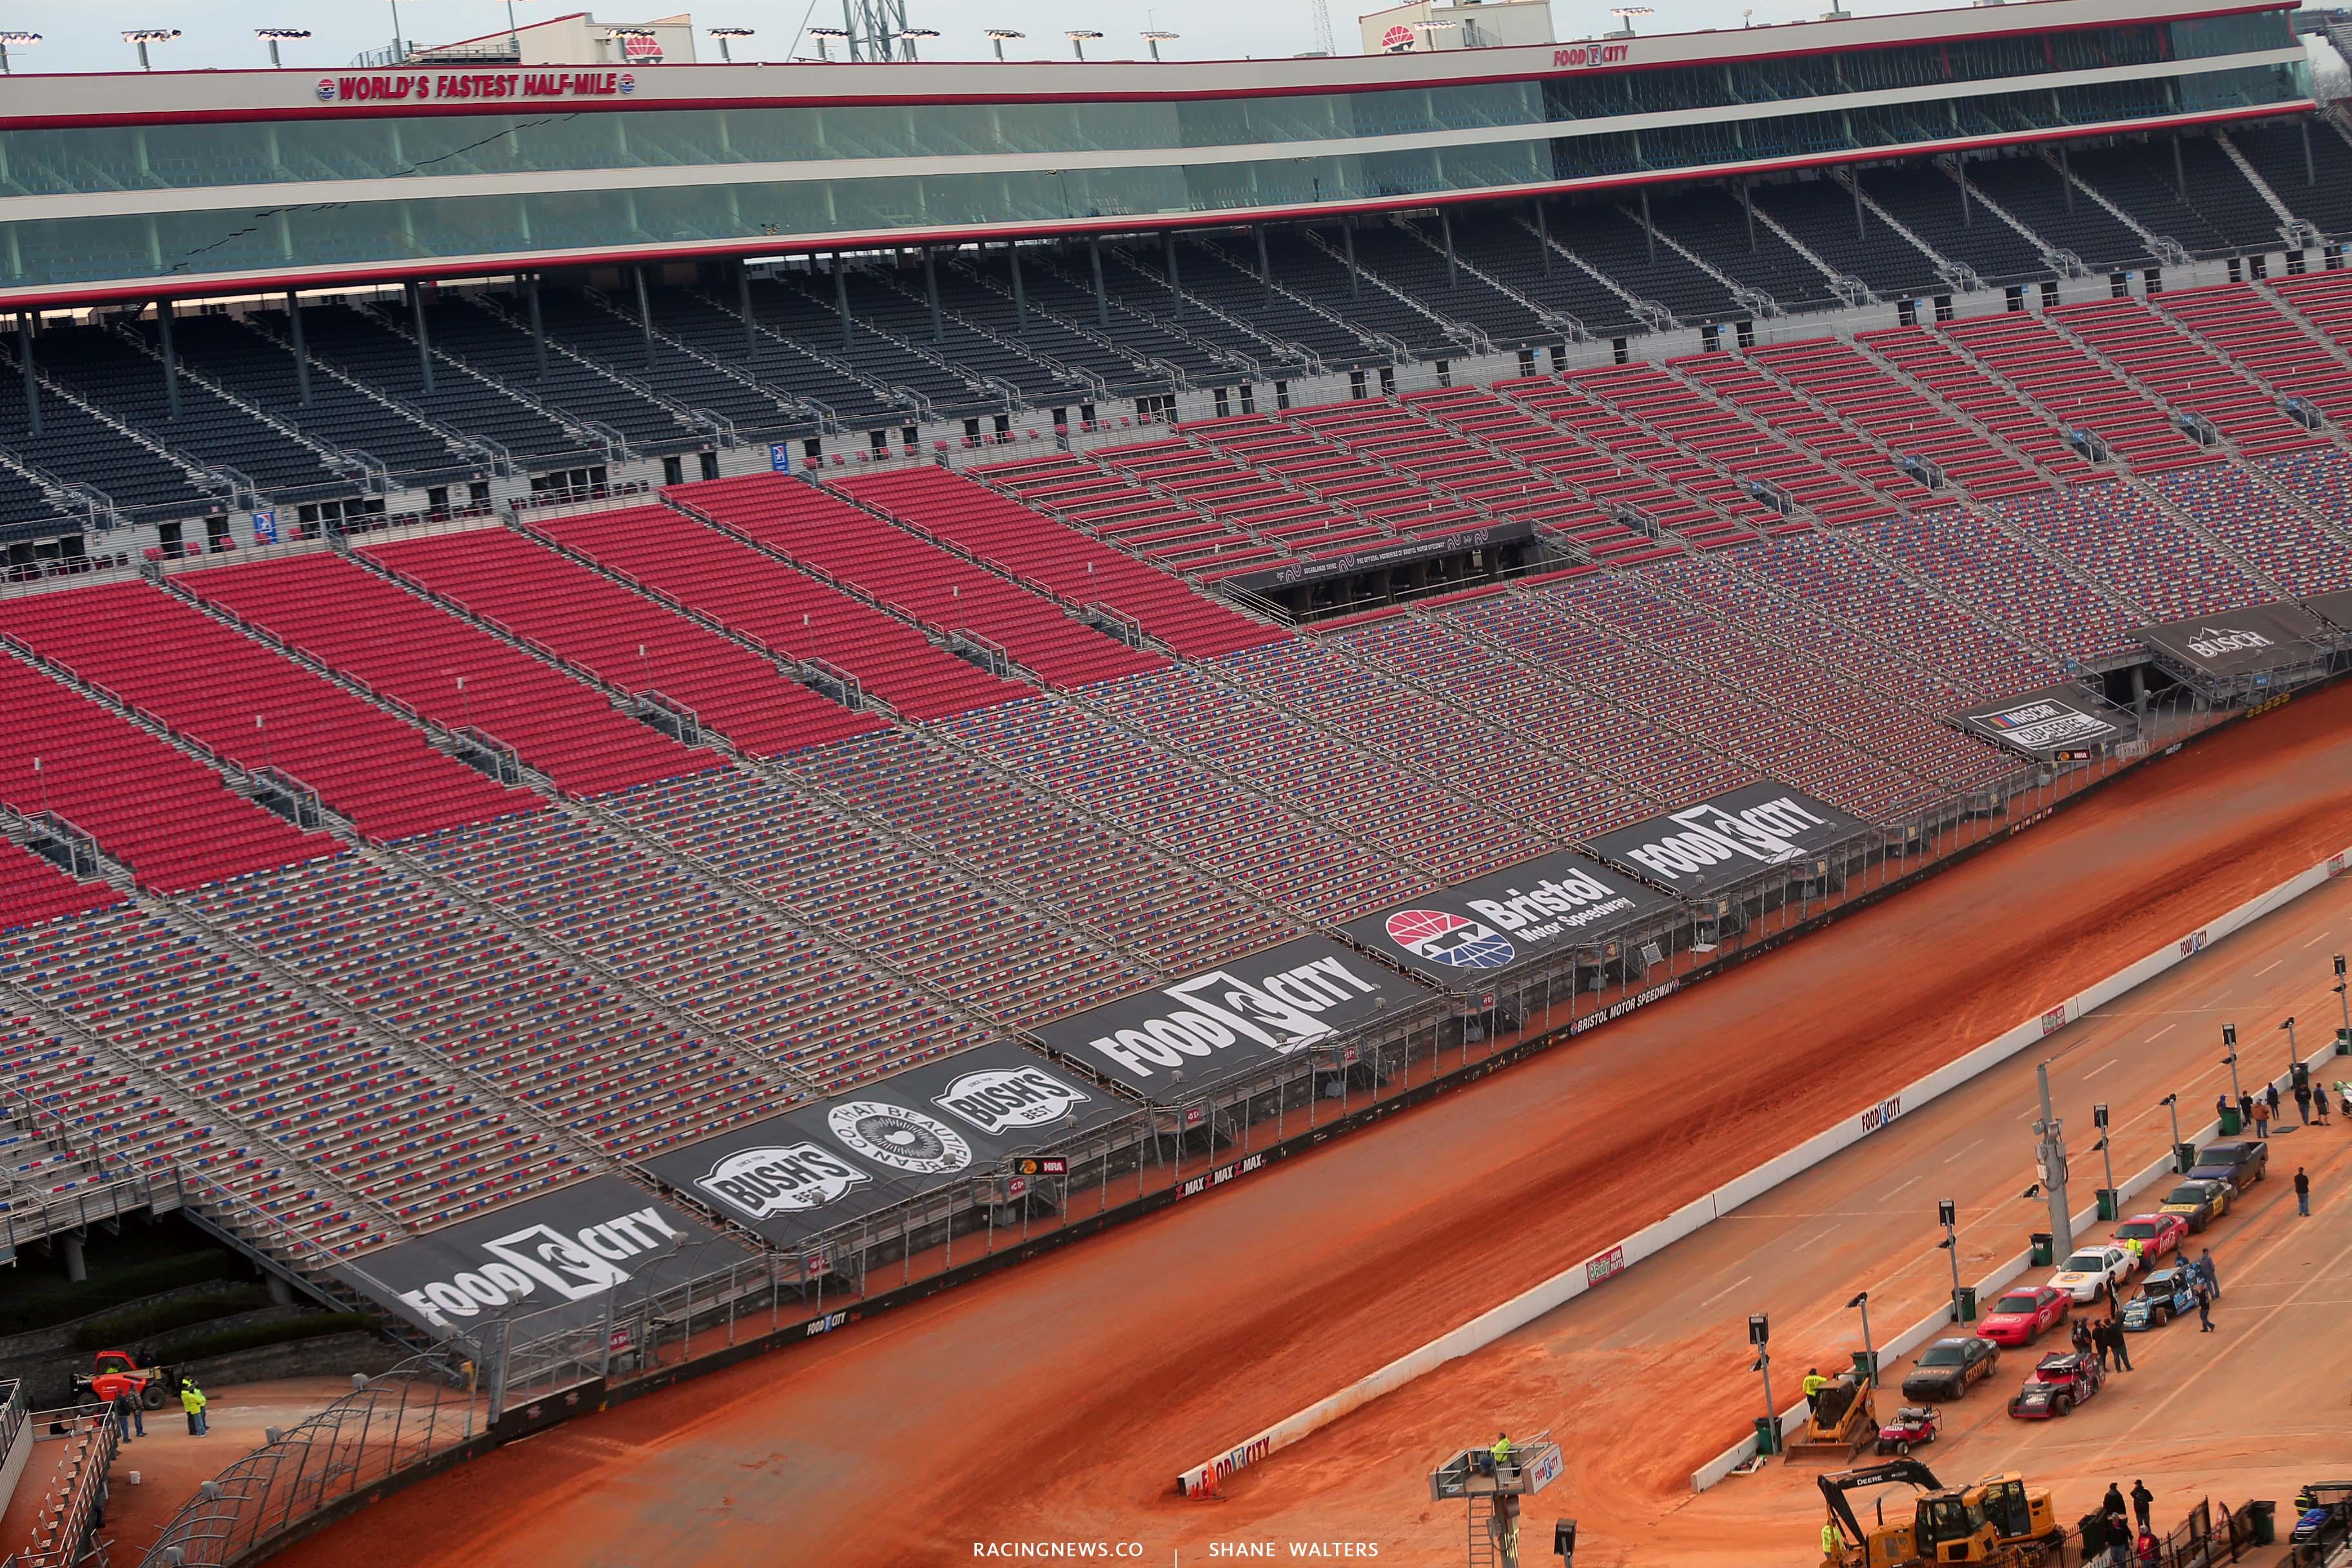 World's Fastest Half Mile - Bristol Motor Speedway - NASCAR Dirt Track